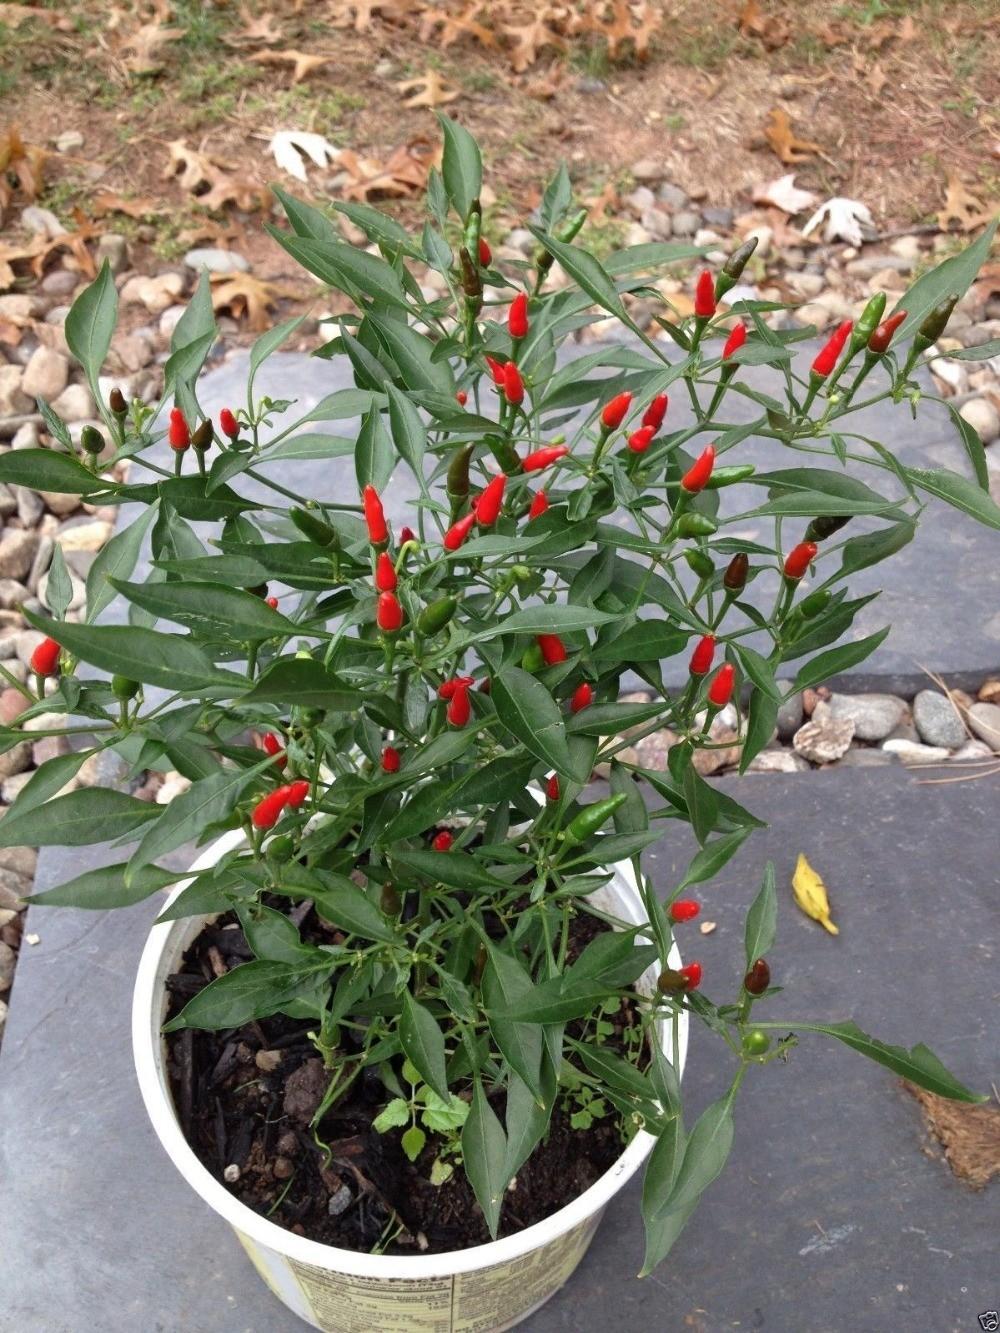 Seeds-Chili-Pepper-Seeds-Vegetable-seeds-Basket-of-Fire-garden-decoration-100pcs-B01 (2)